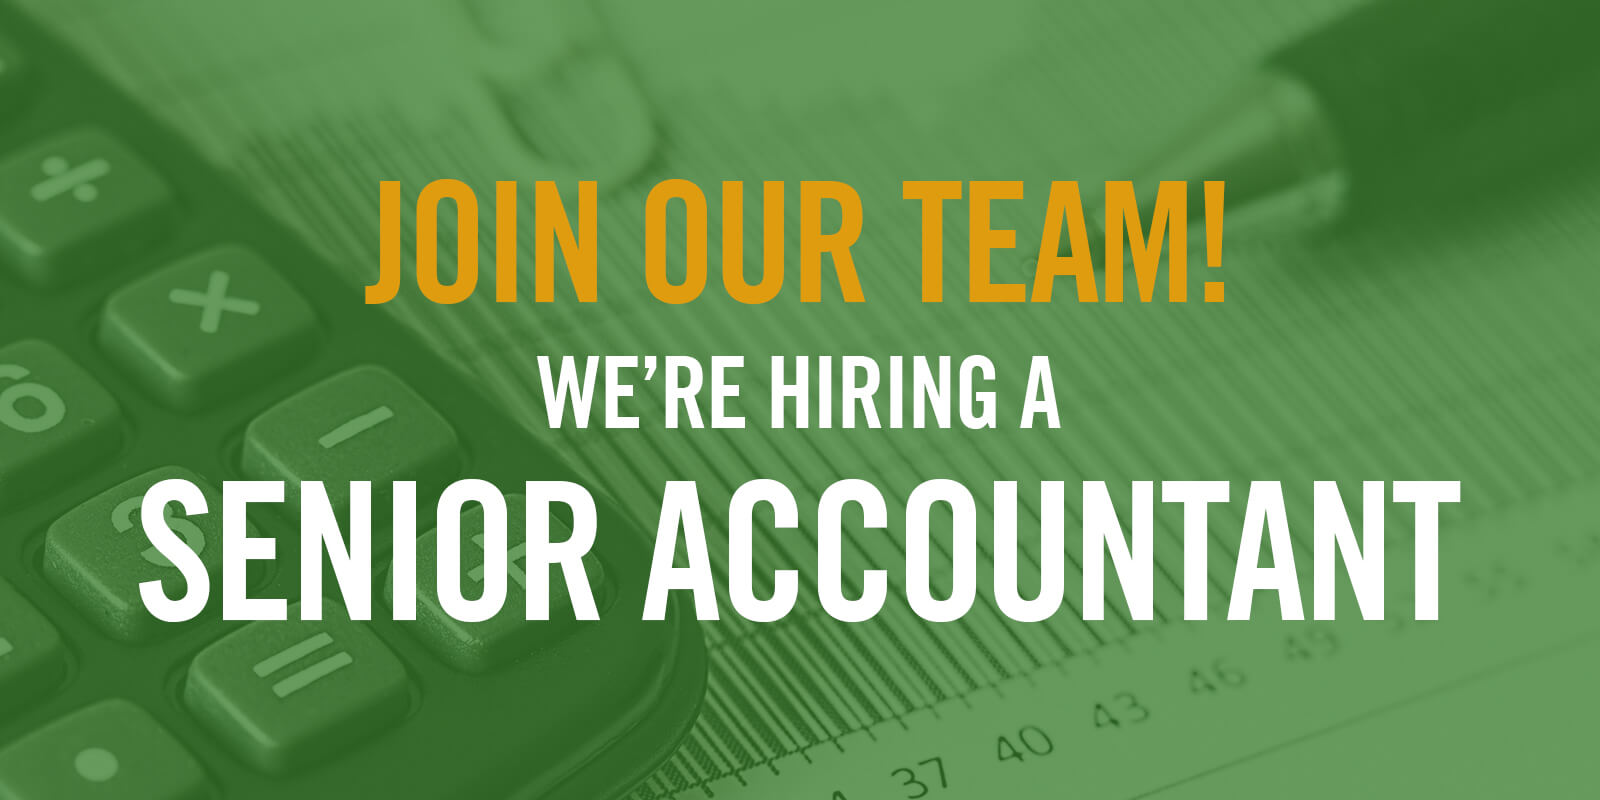 Join Our Team. Senior Accountant